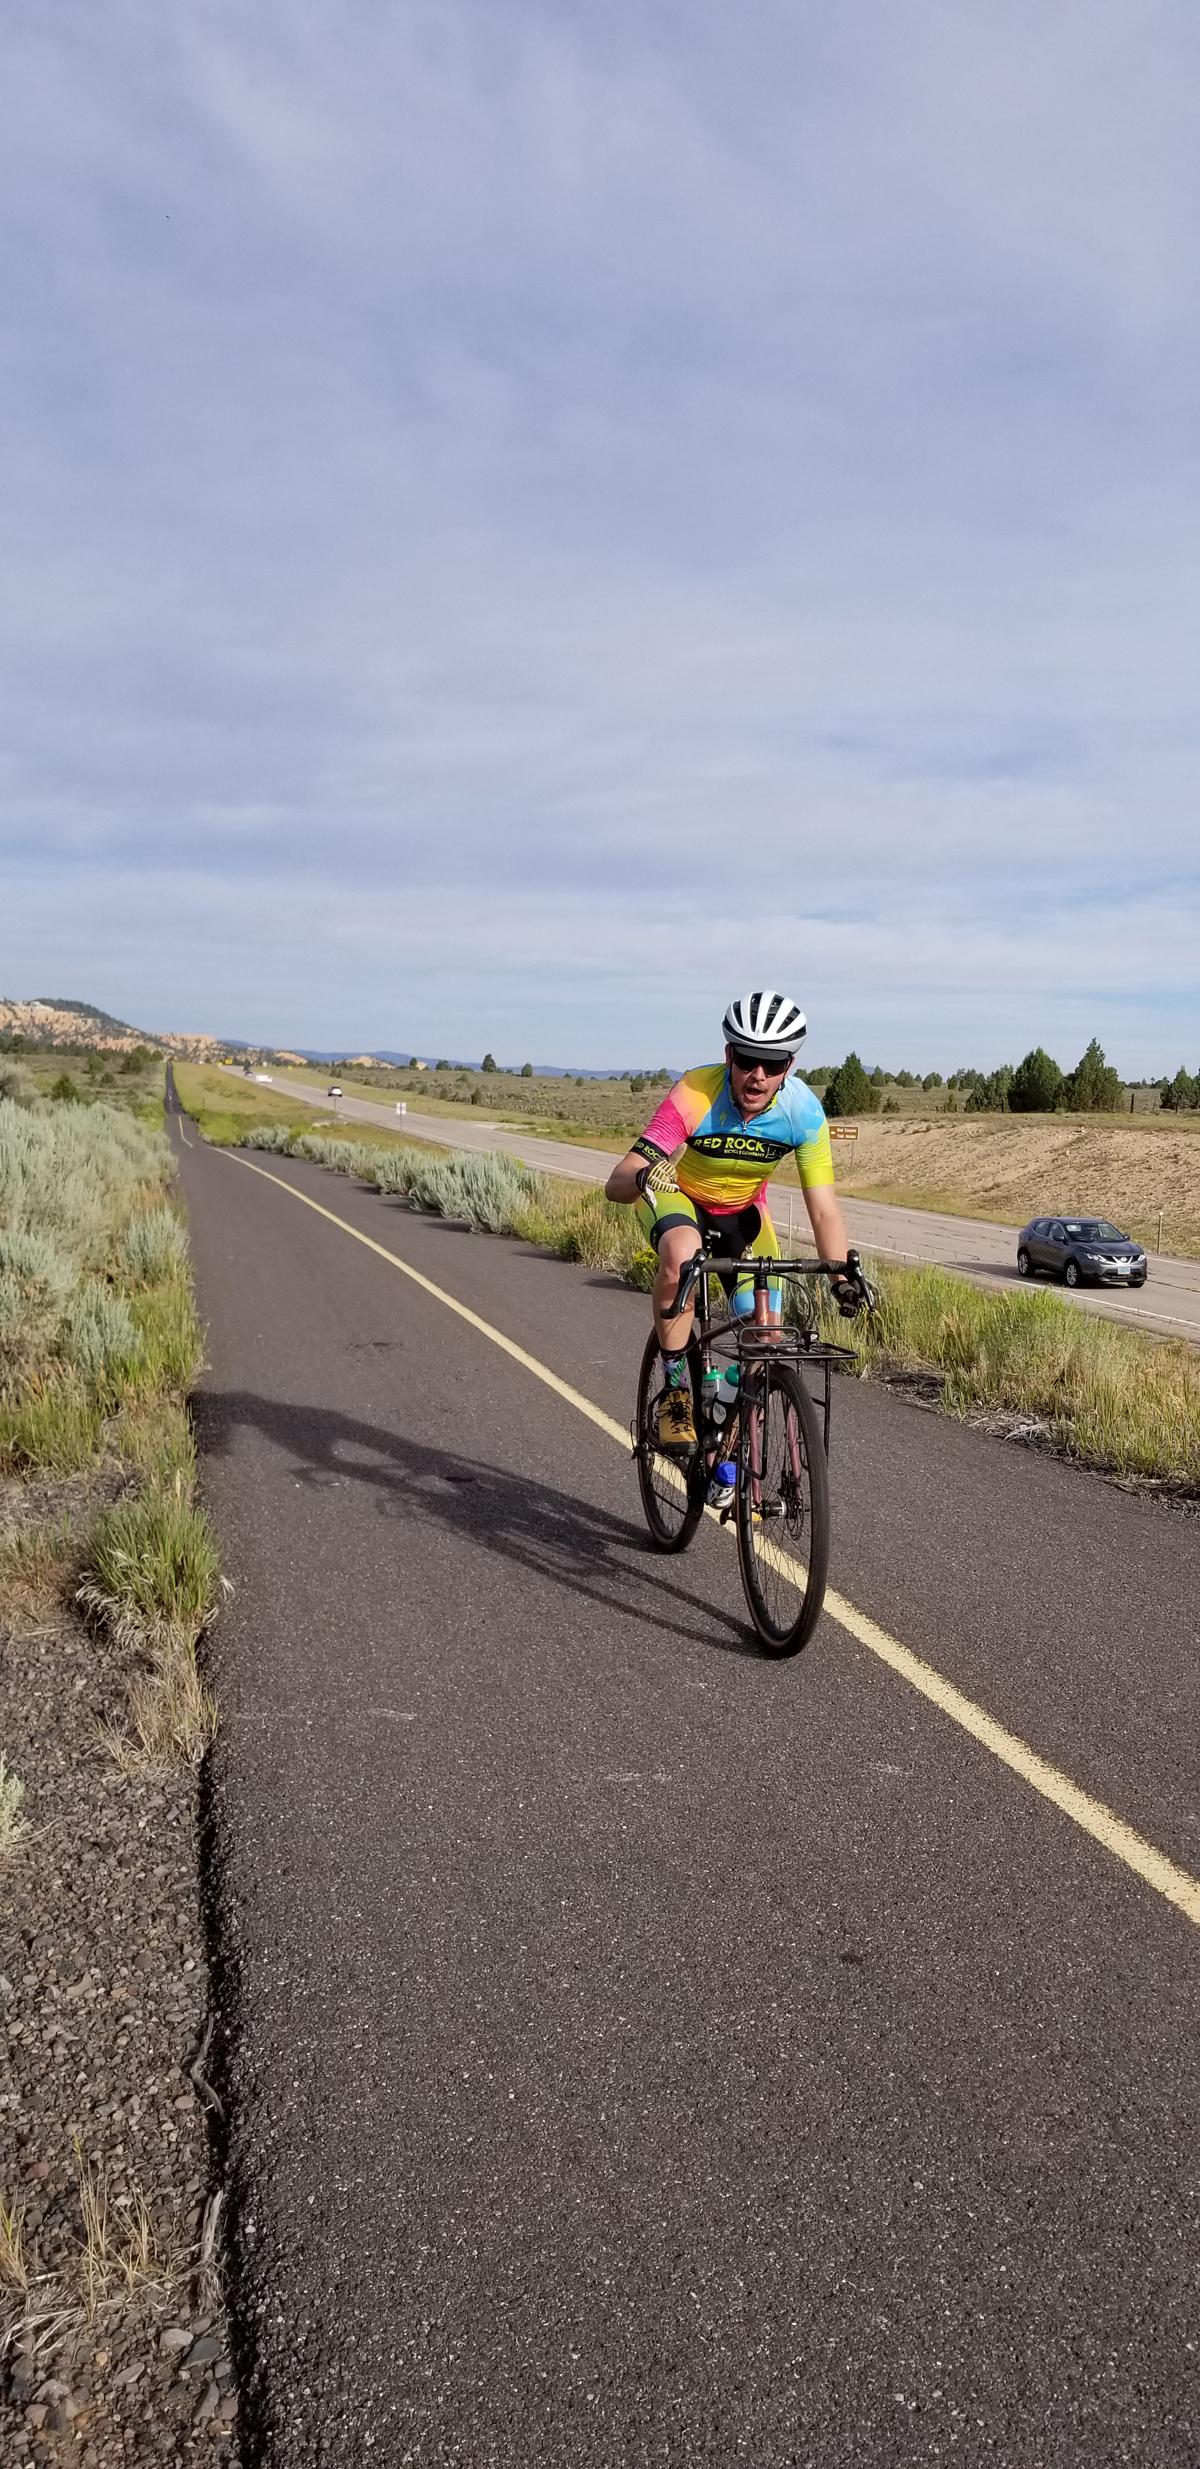 Joey Dye rocking the bike path on the return trip down the bike path in Red Canyon. Photo by Lukas Brinkerhoff